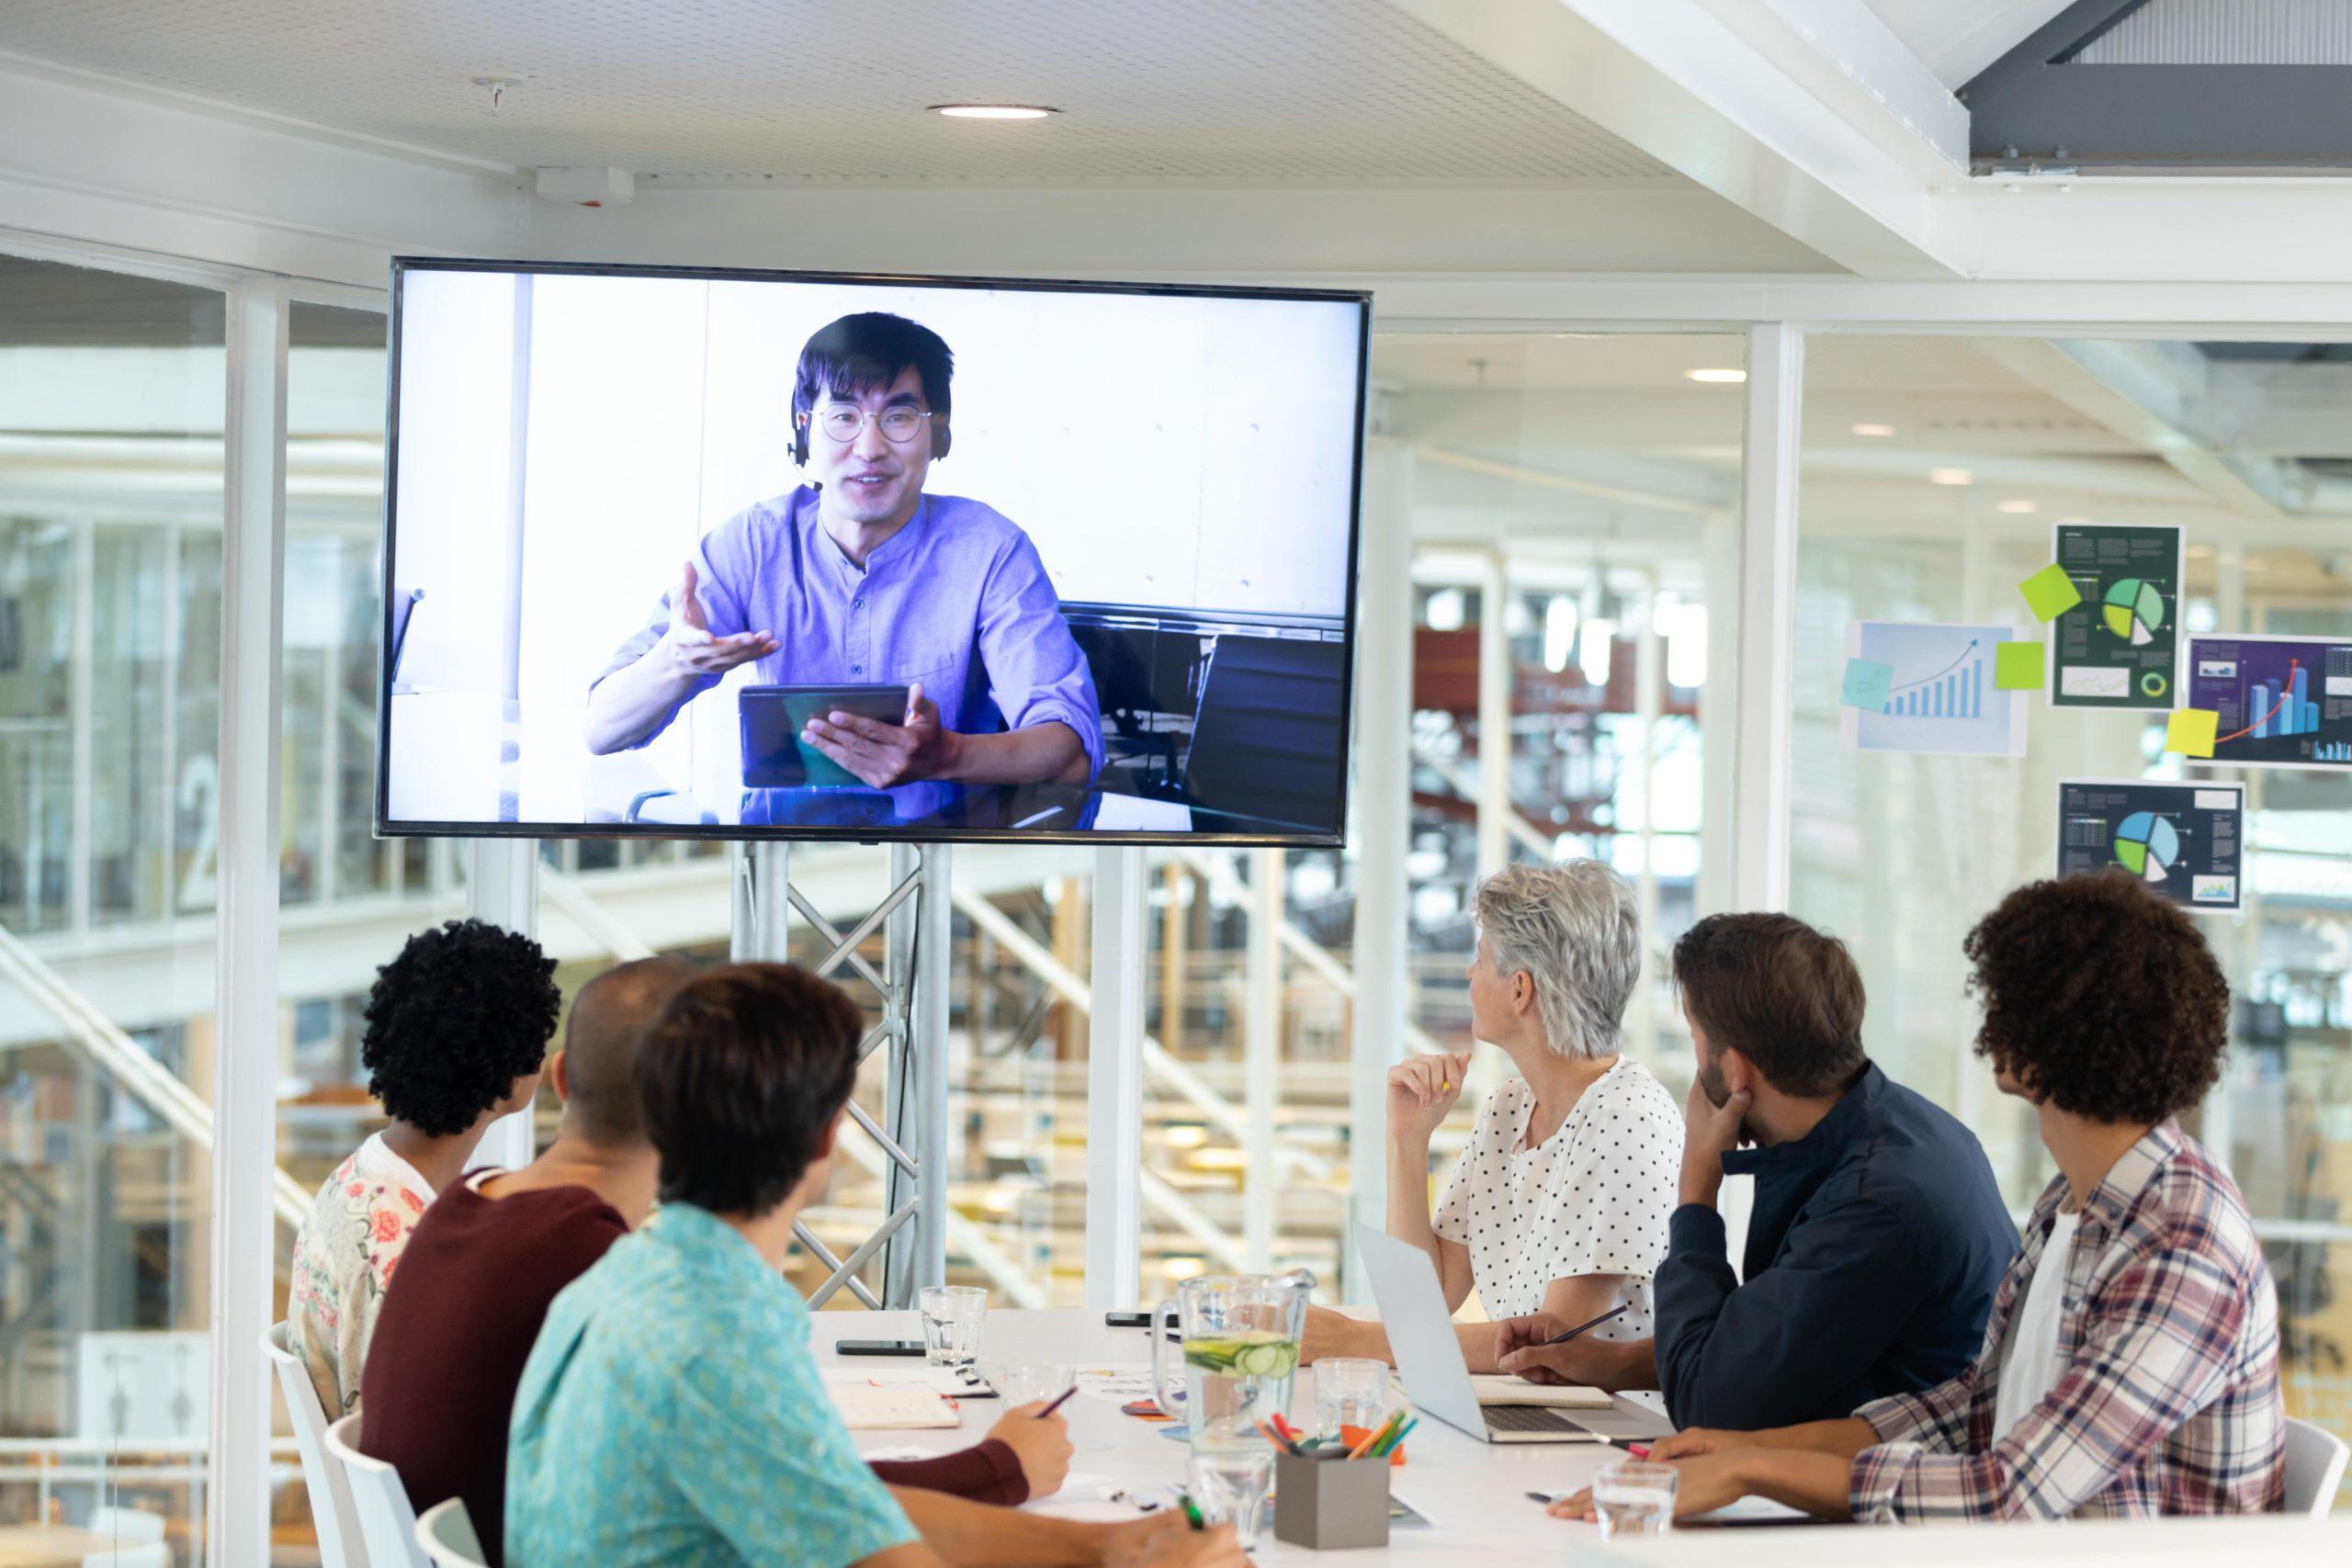 oratory training in company